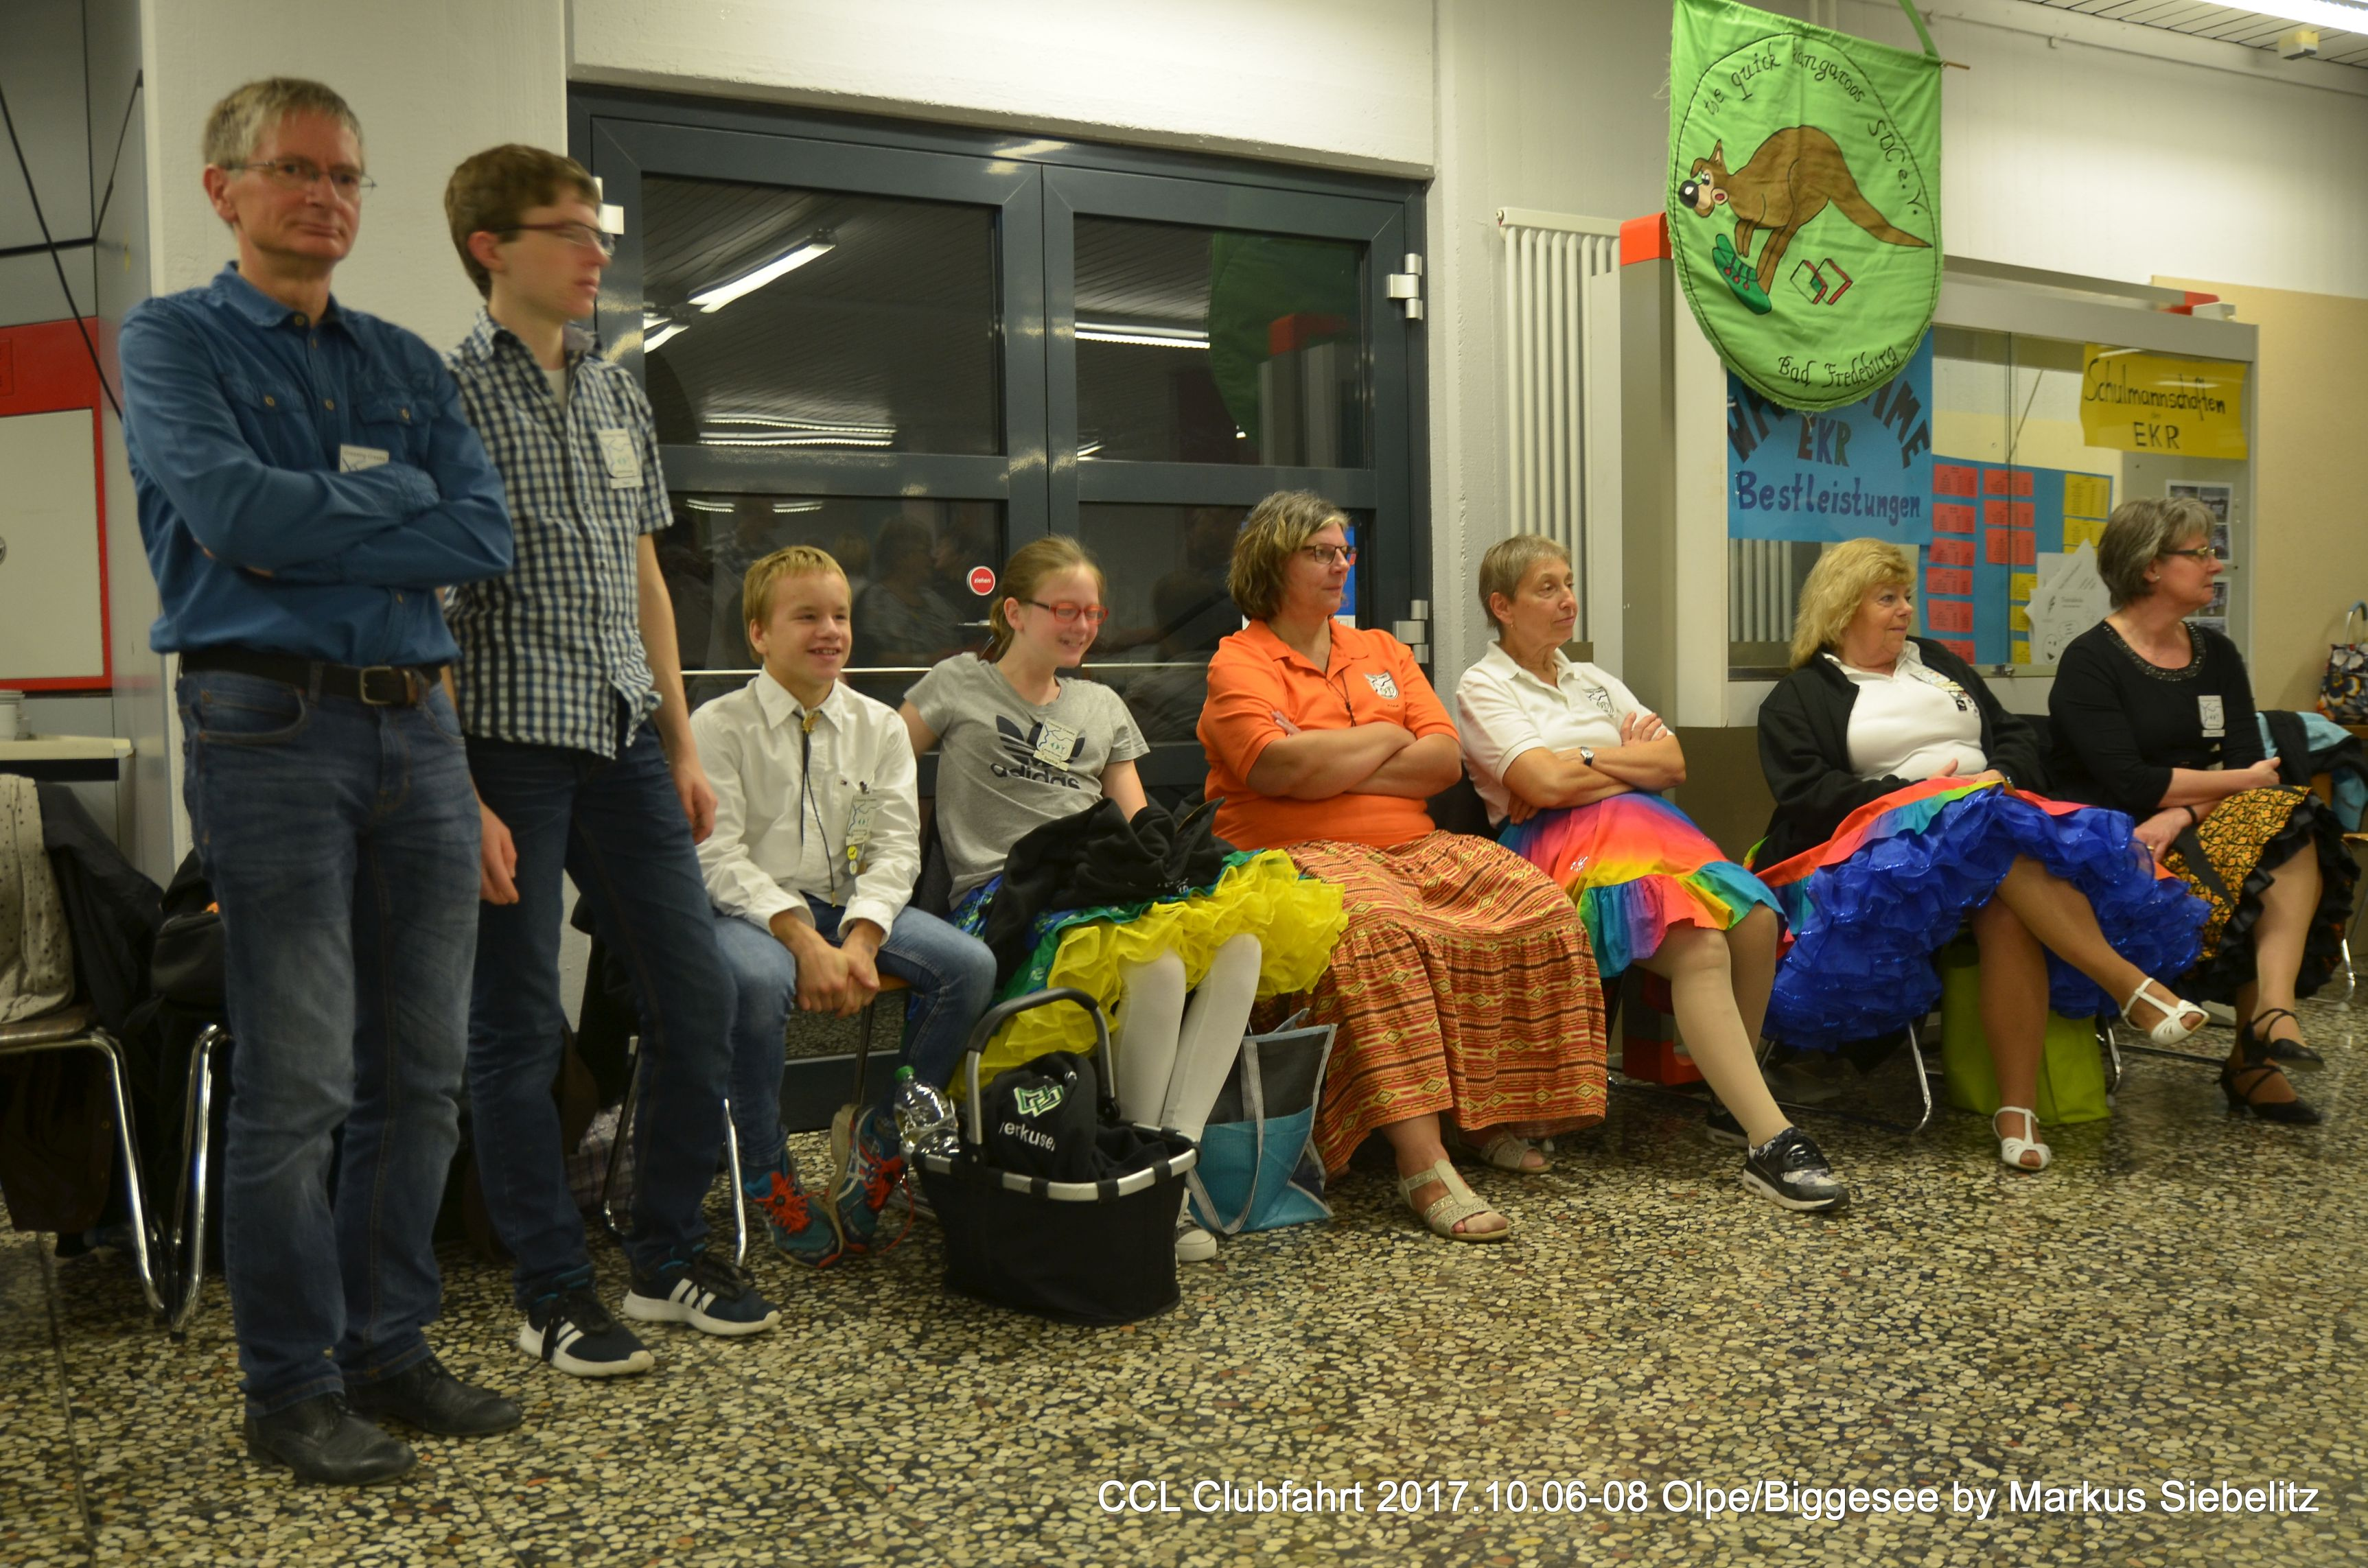 CCL Clubfahrt 2017.10.06-08 Biggesee (24)